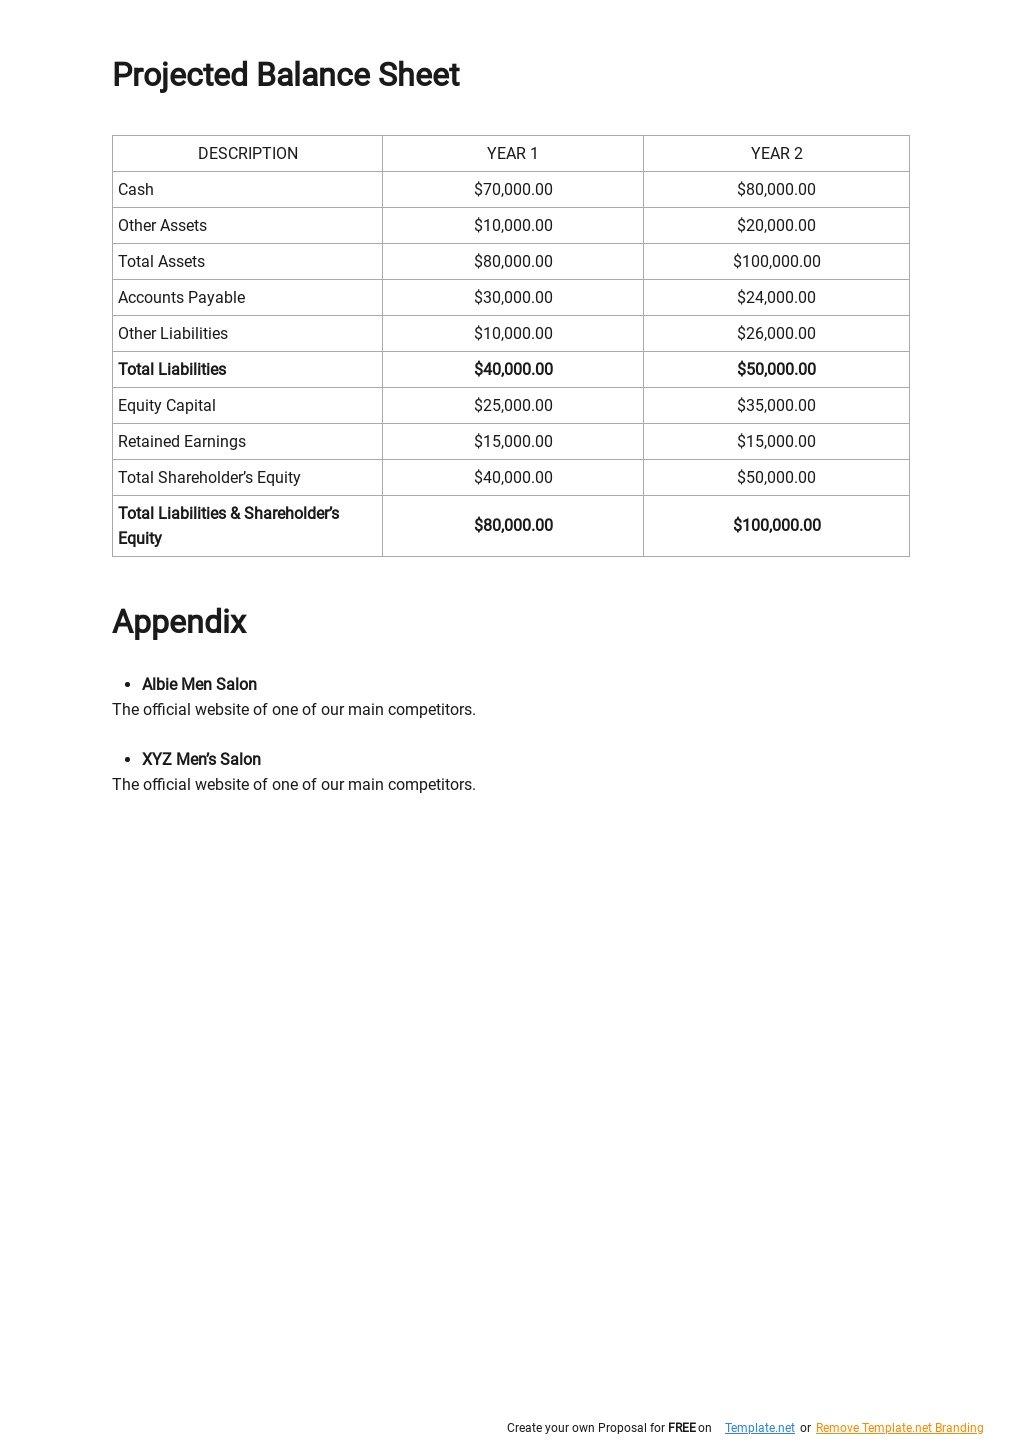 Men's Salon Business Plan Template [Free PDF] - Google Docs, Word, Apple Pages, PDF